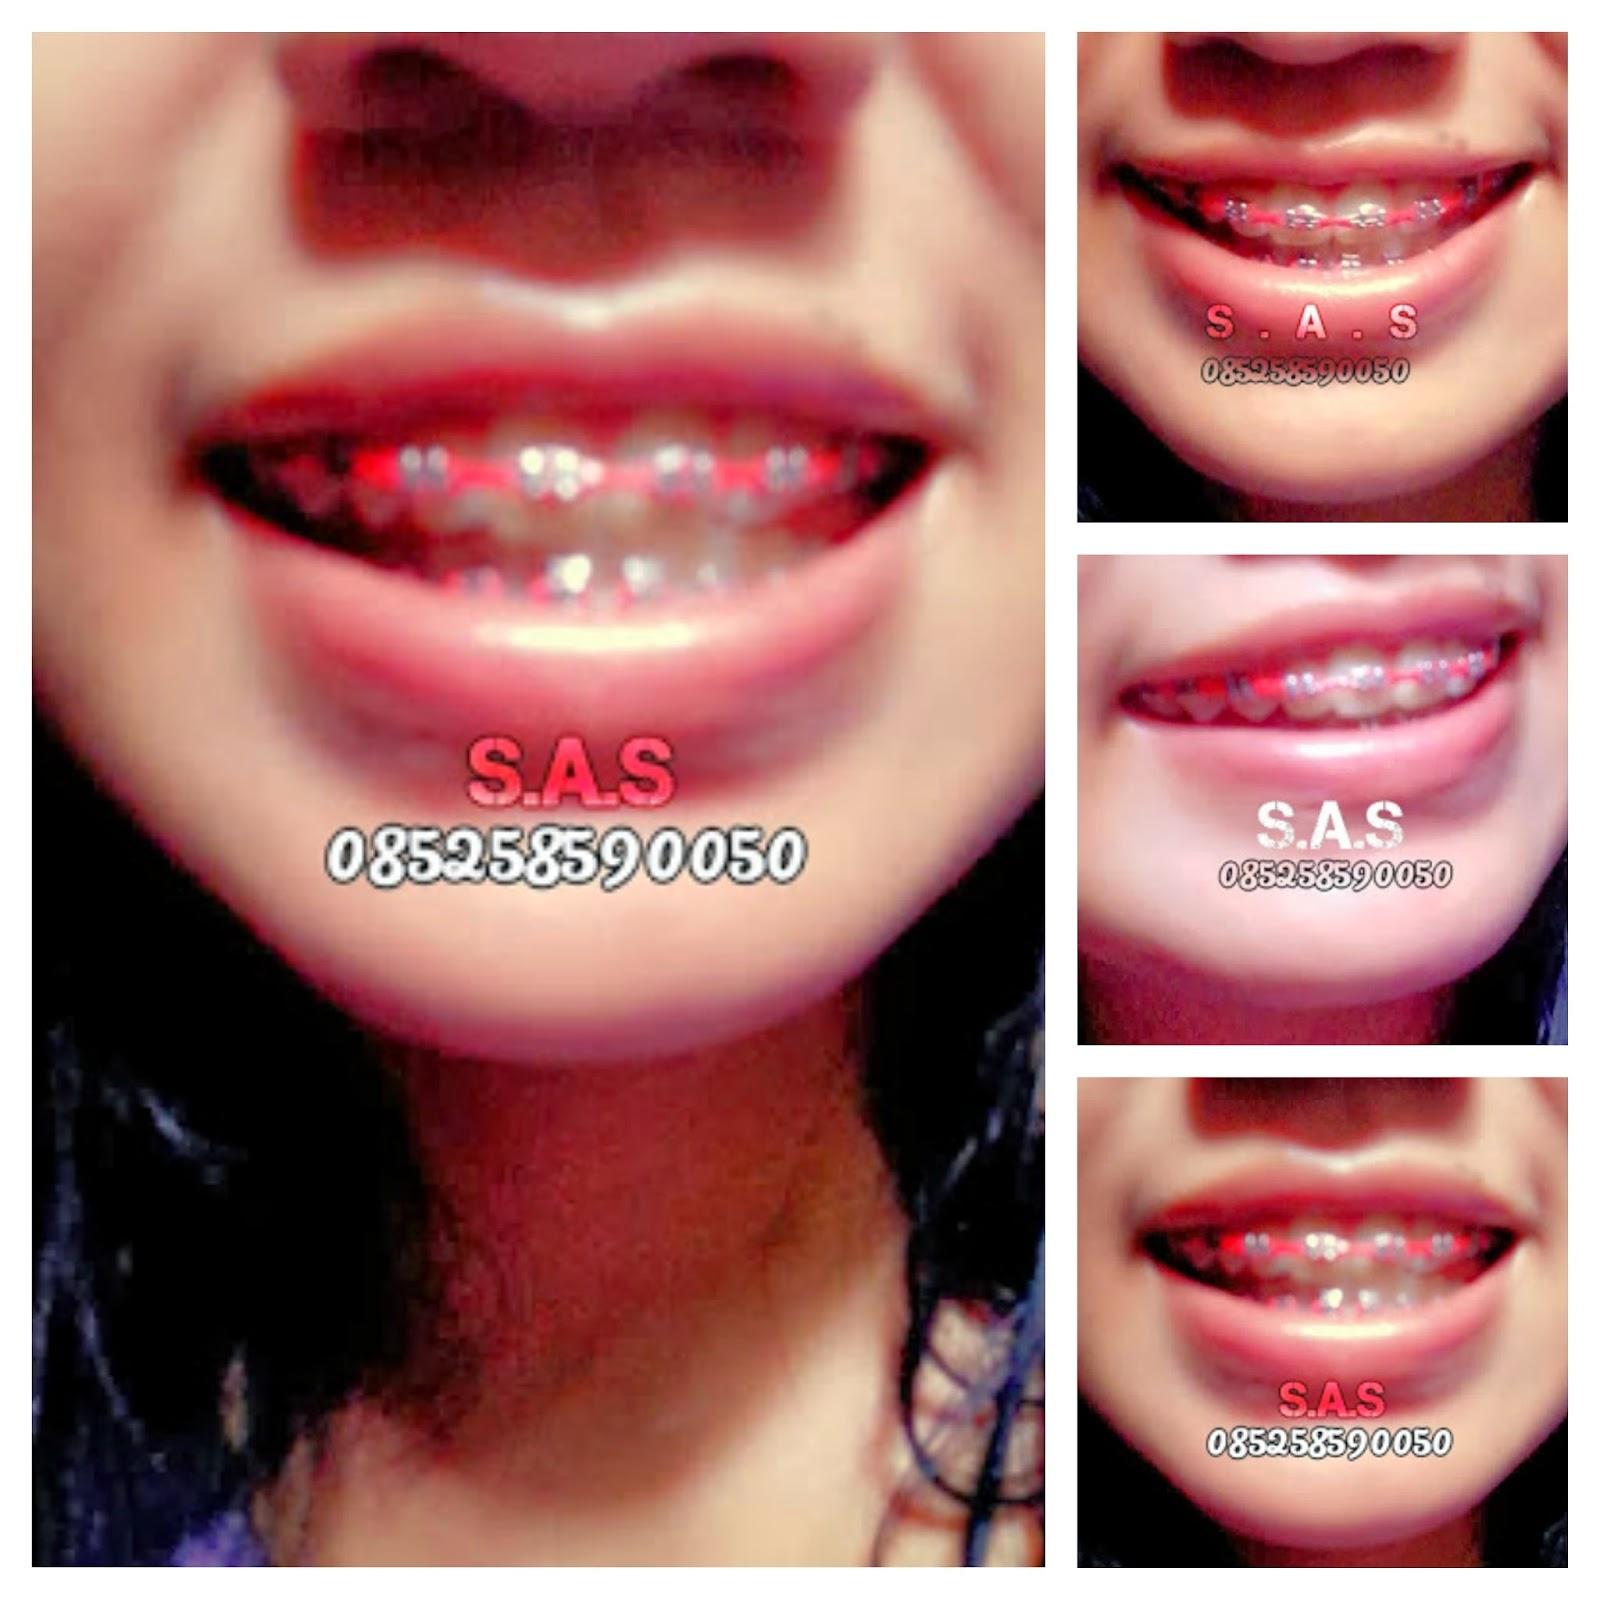 Koleksi Foto Cewek Berkawat Gigi Part 1 Versi S A S S A